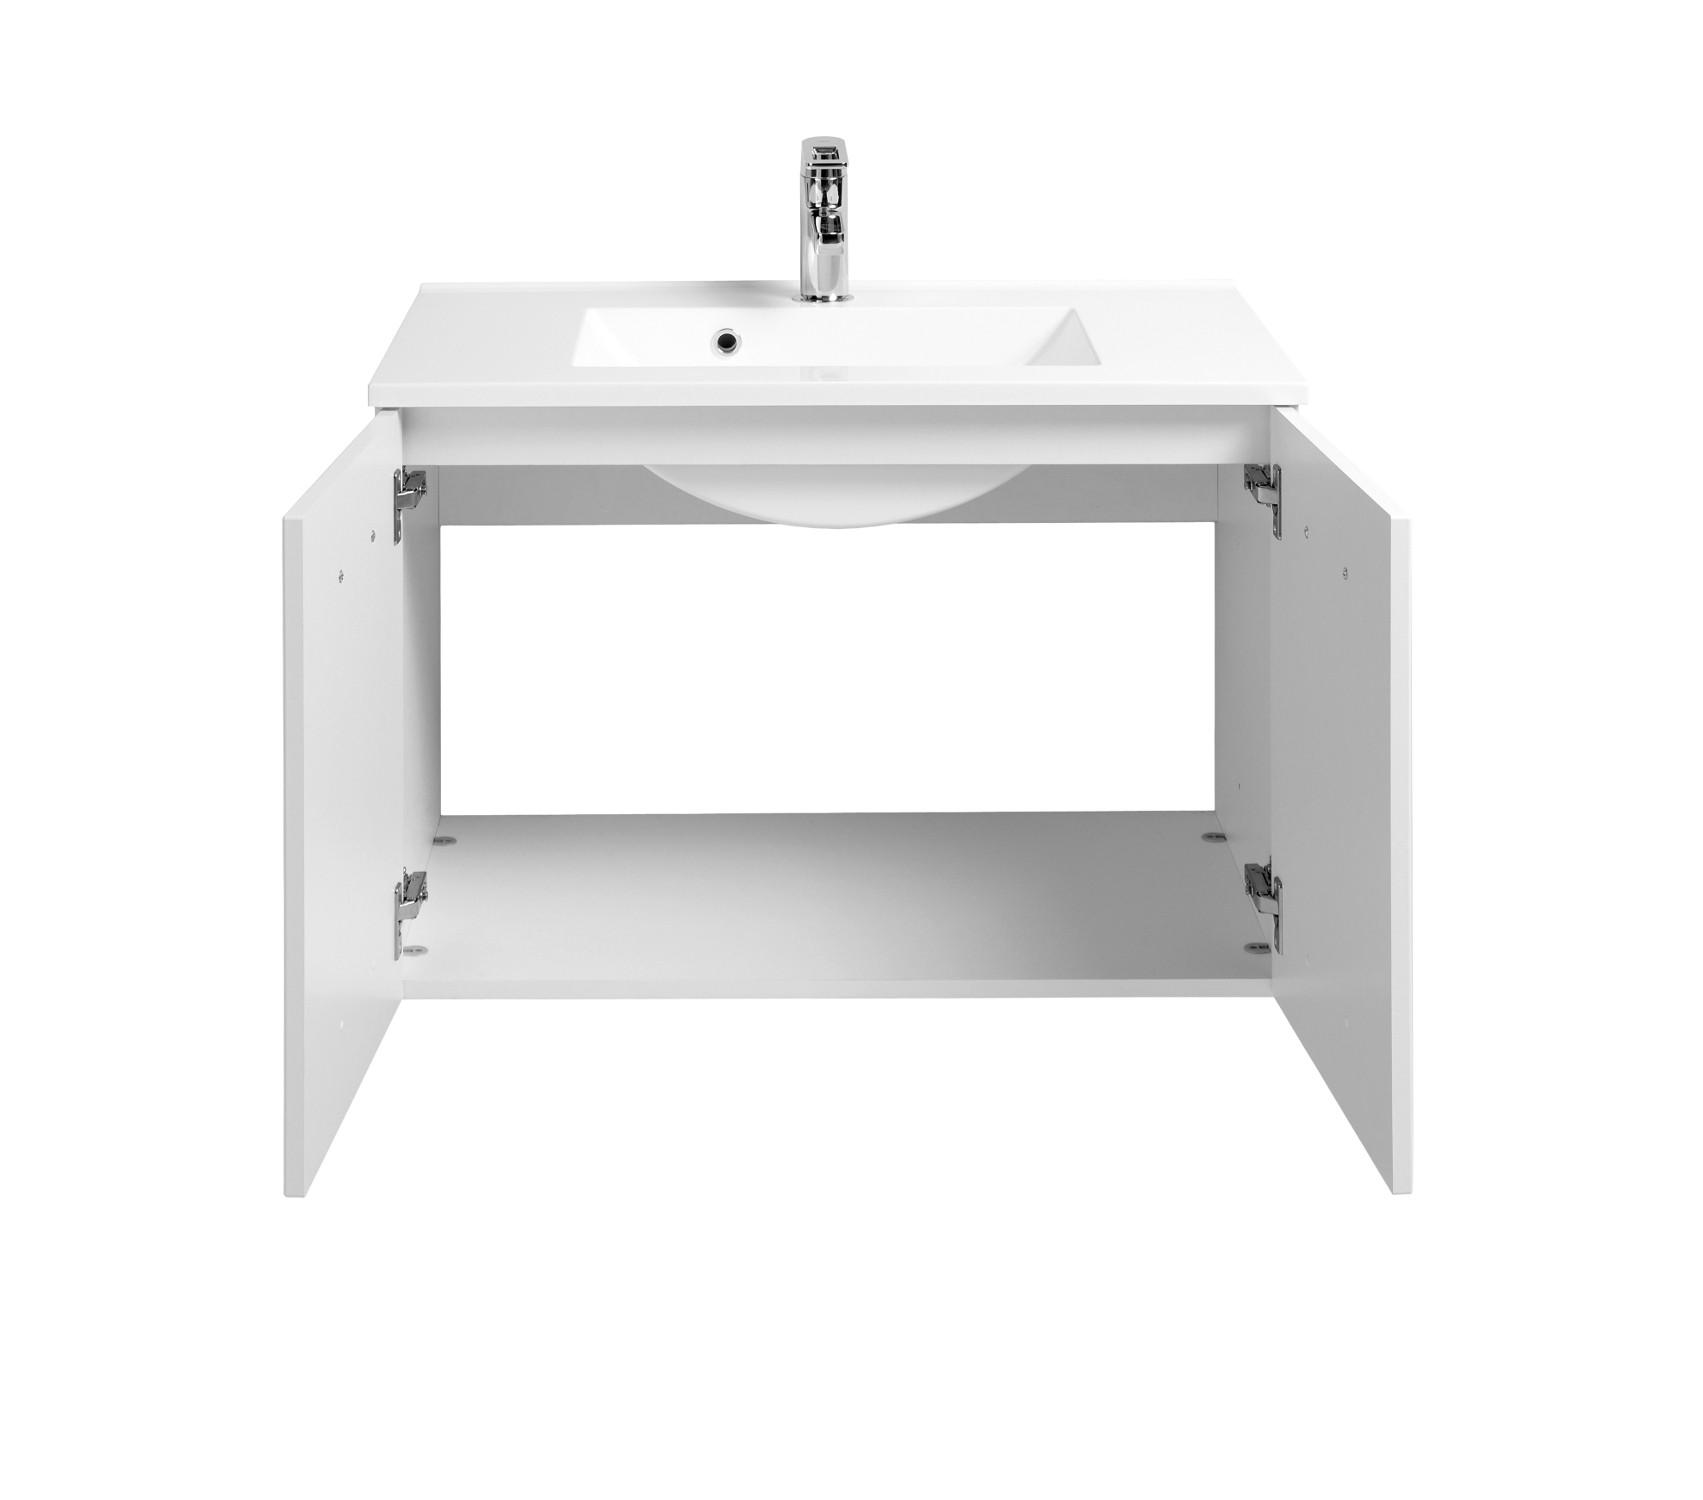 bad waschtisch bologna 2 t rig 80 cm breit hochglanz wei wei bad bologna. Black Bedroom Furniture Sets. Home Design Ideas